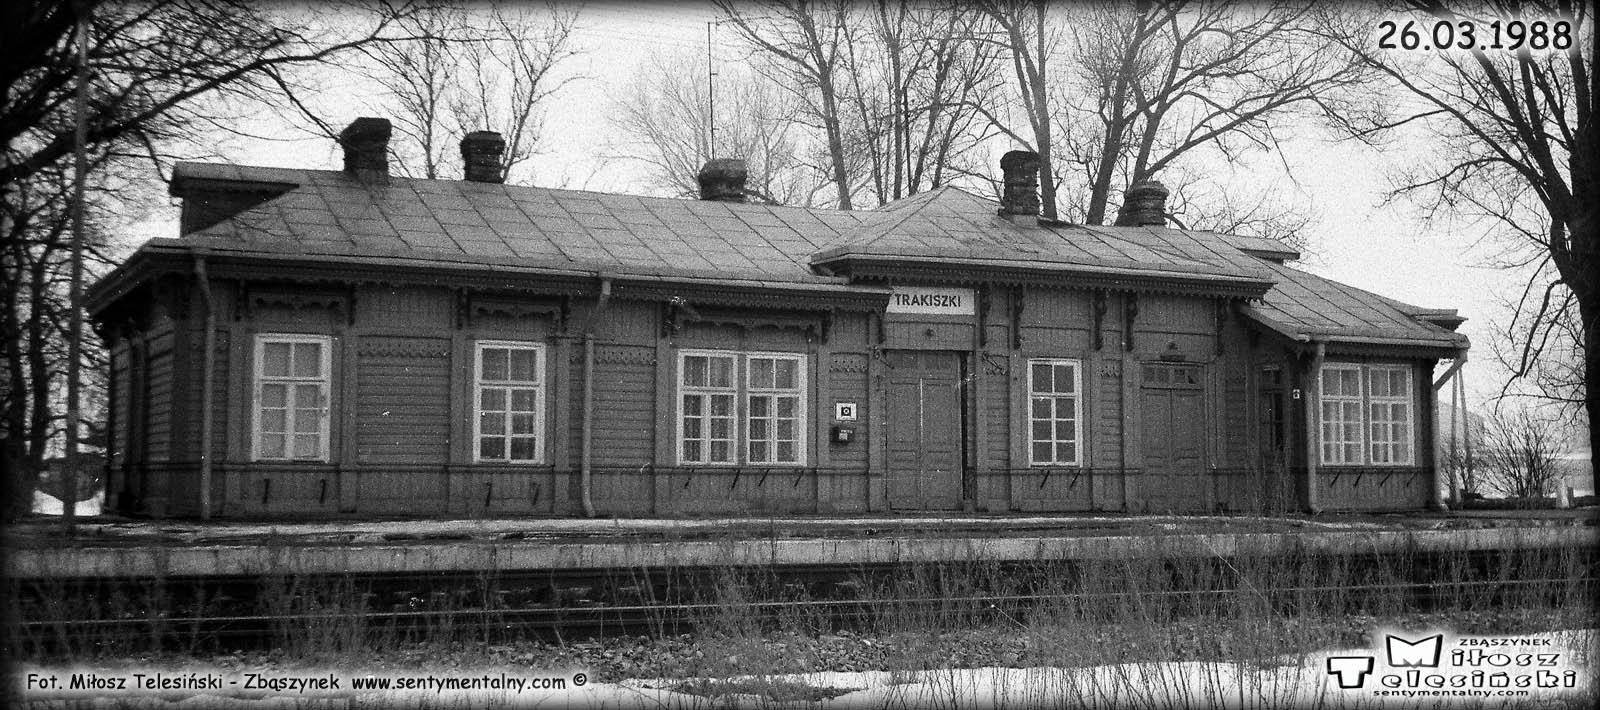 Dworzec Trakiszki